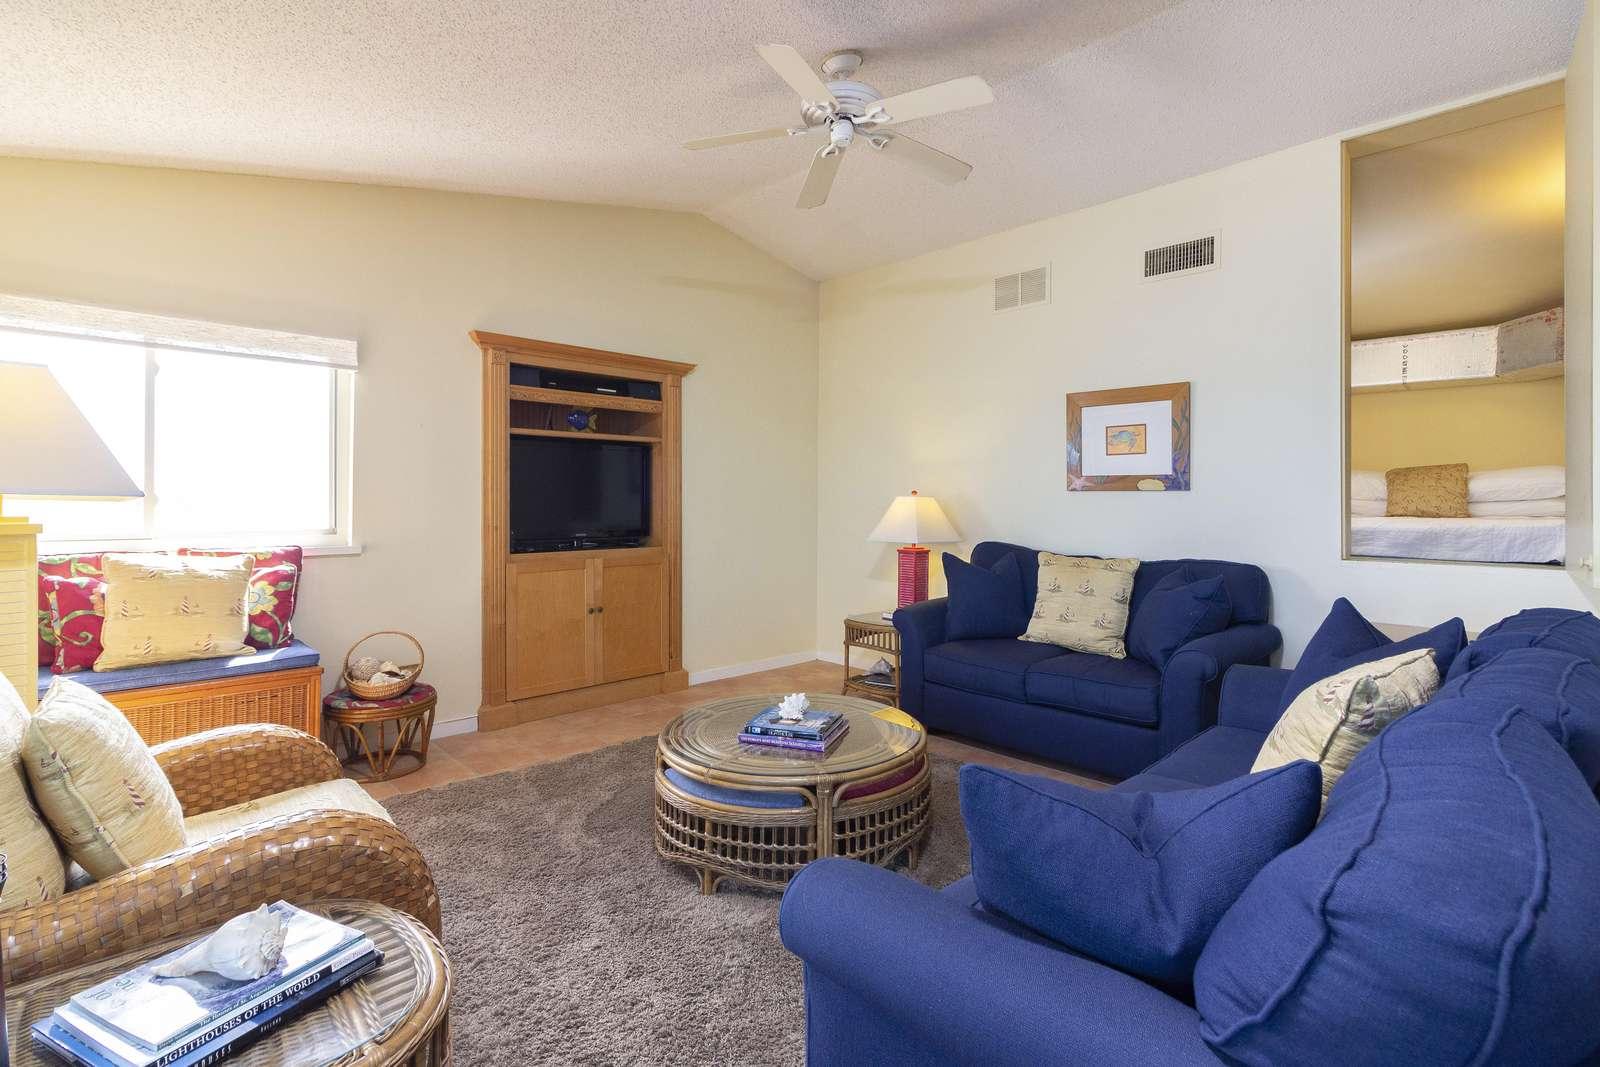 Living Room showing Sleeping Nook Location